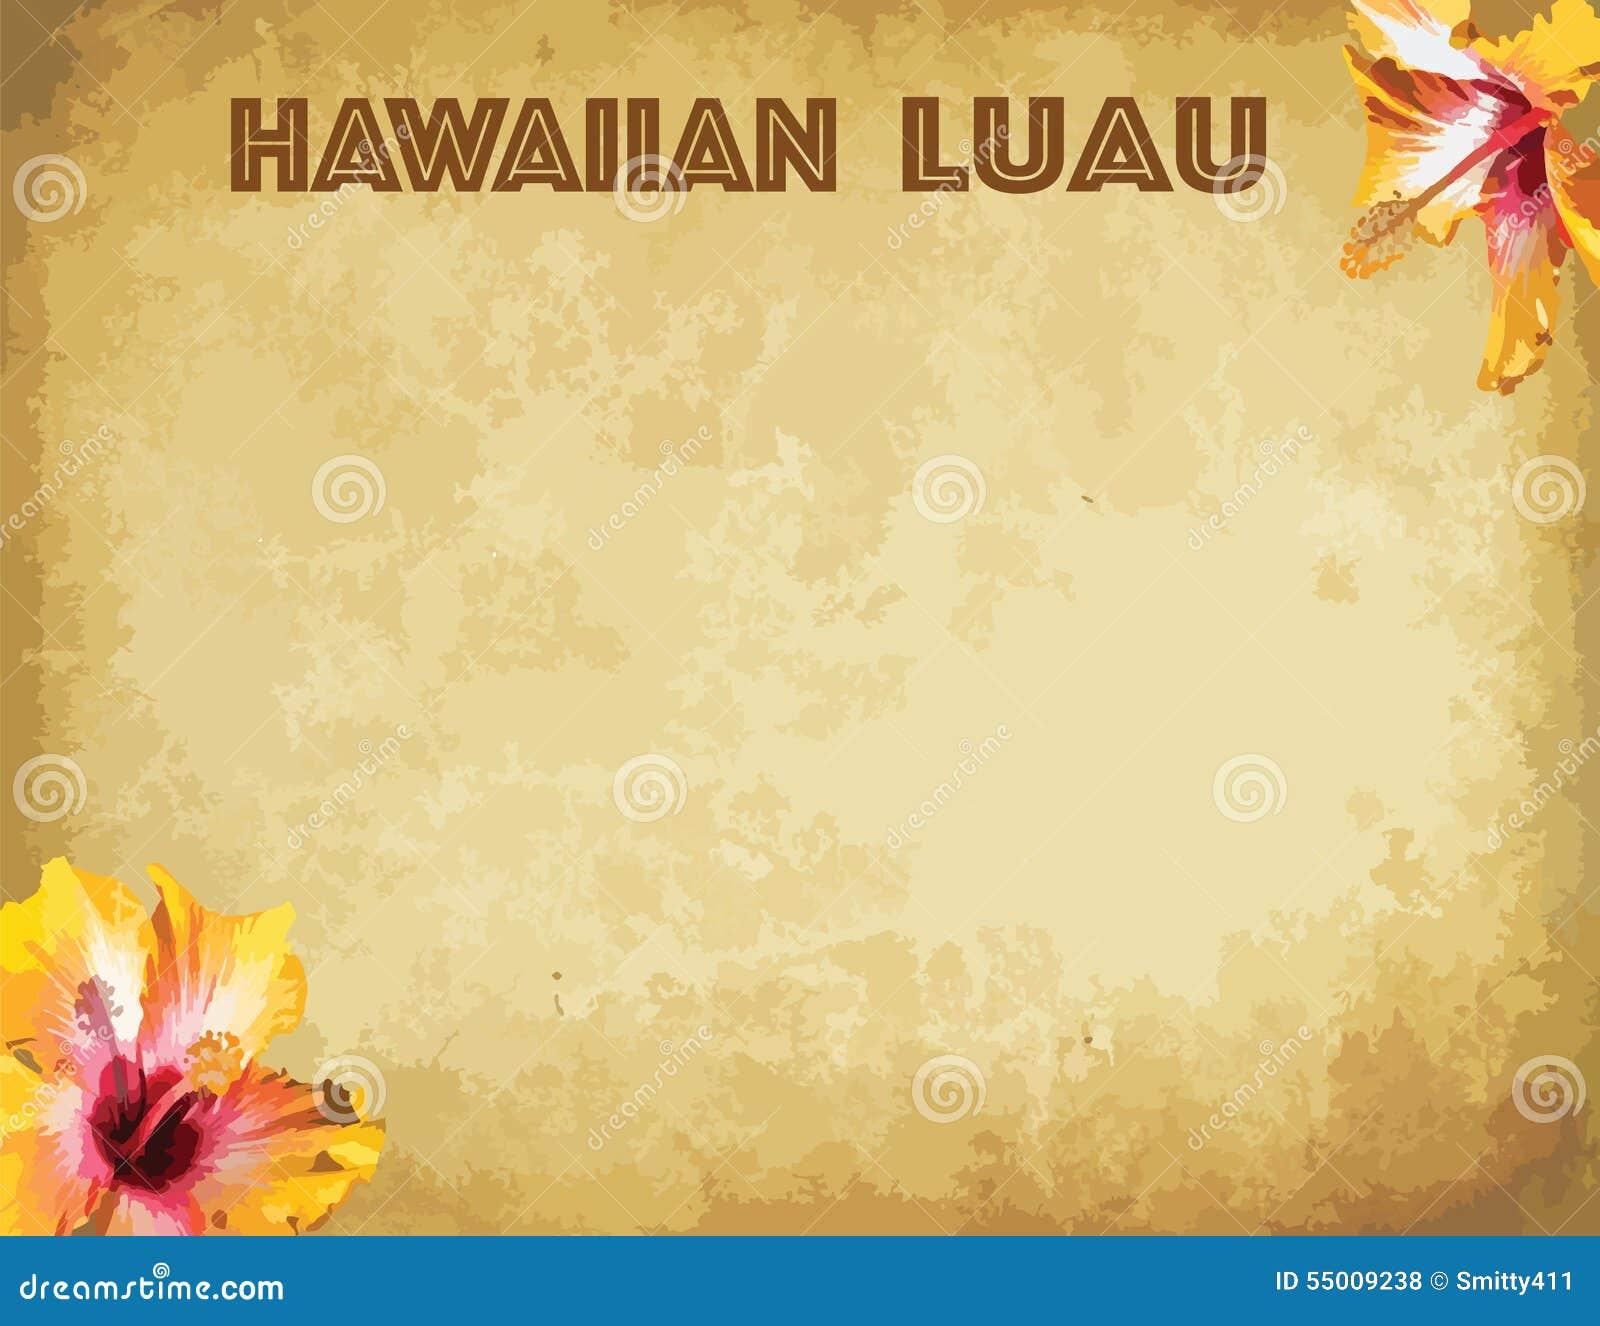 print hawaiian luau party invitation cards stock vector